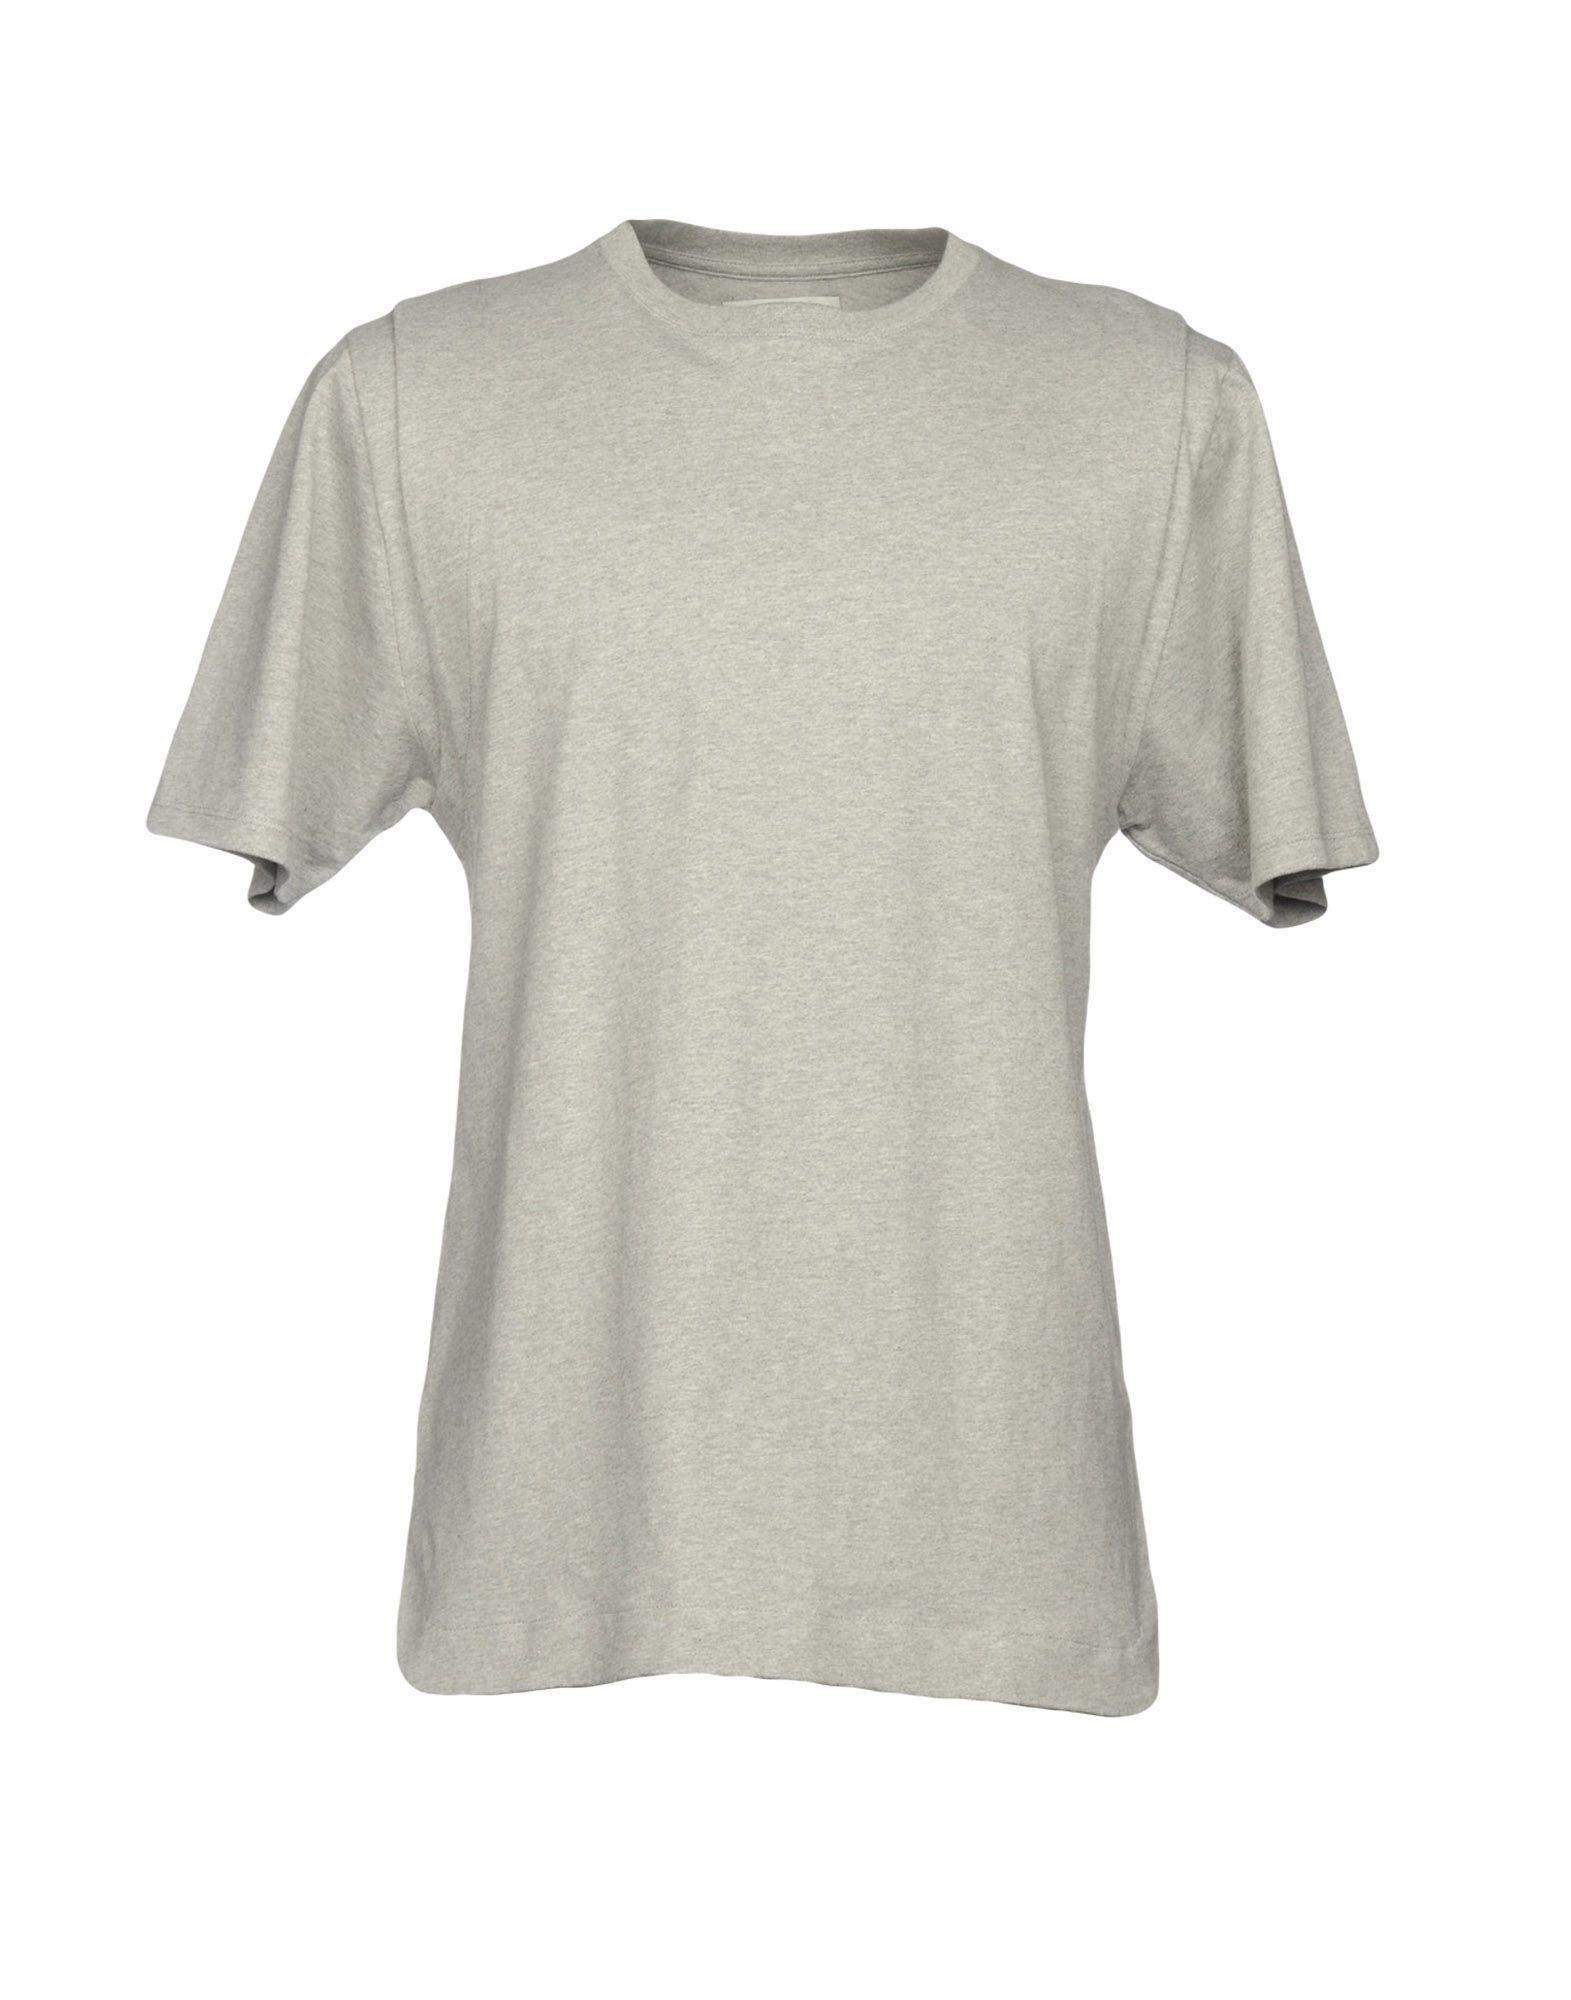 Public School T-Shirt In Light Grey